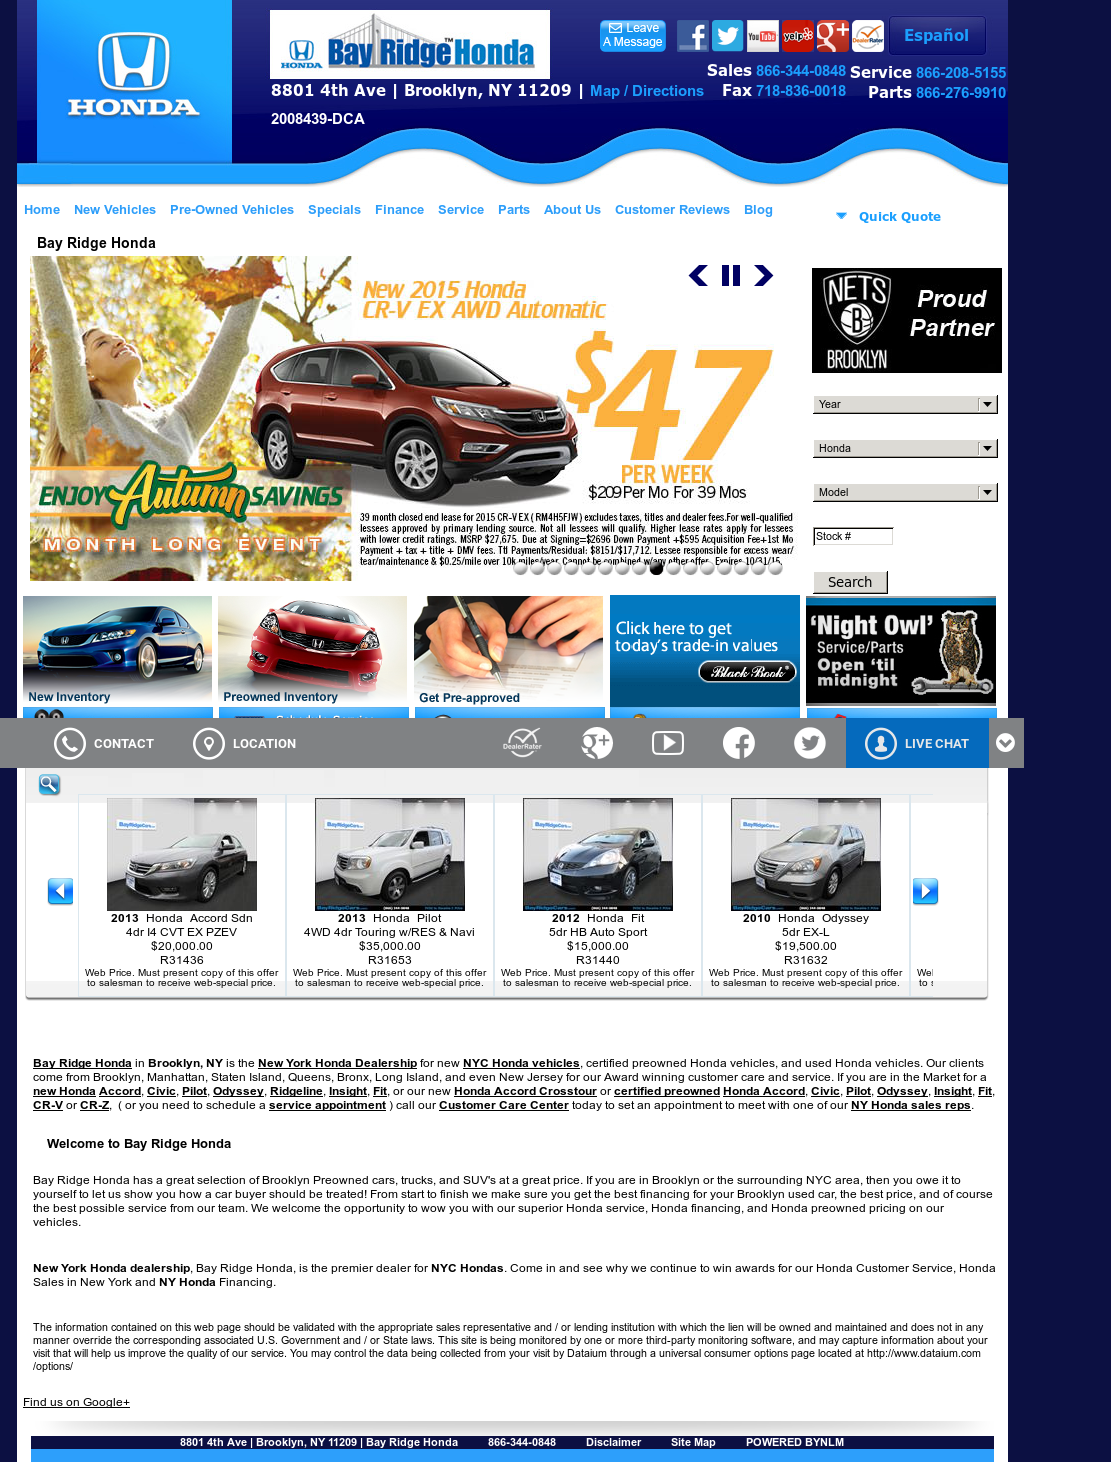 Bay Ridge Honda Competitors, Revenue And Employees   Owler Company Profile